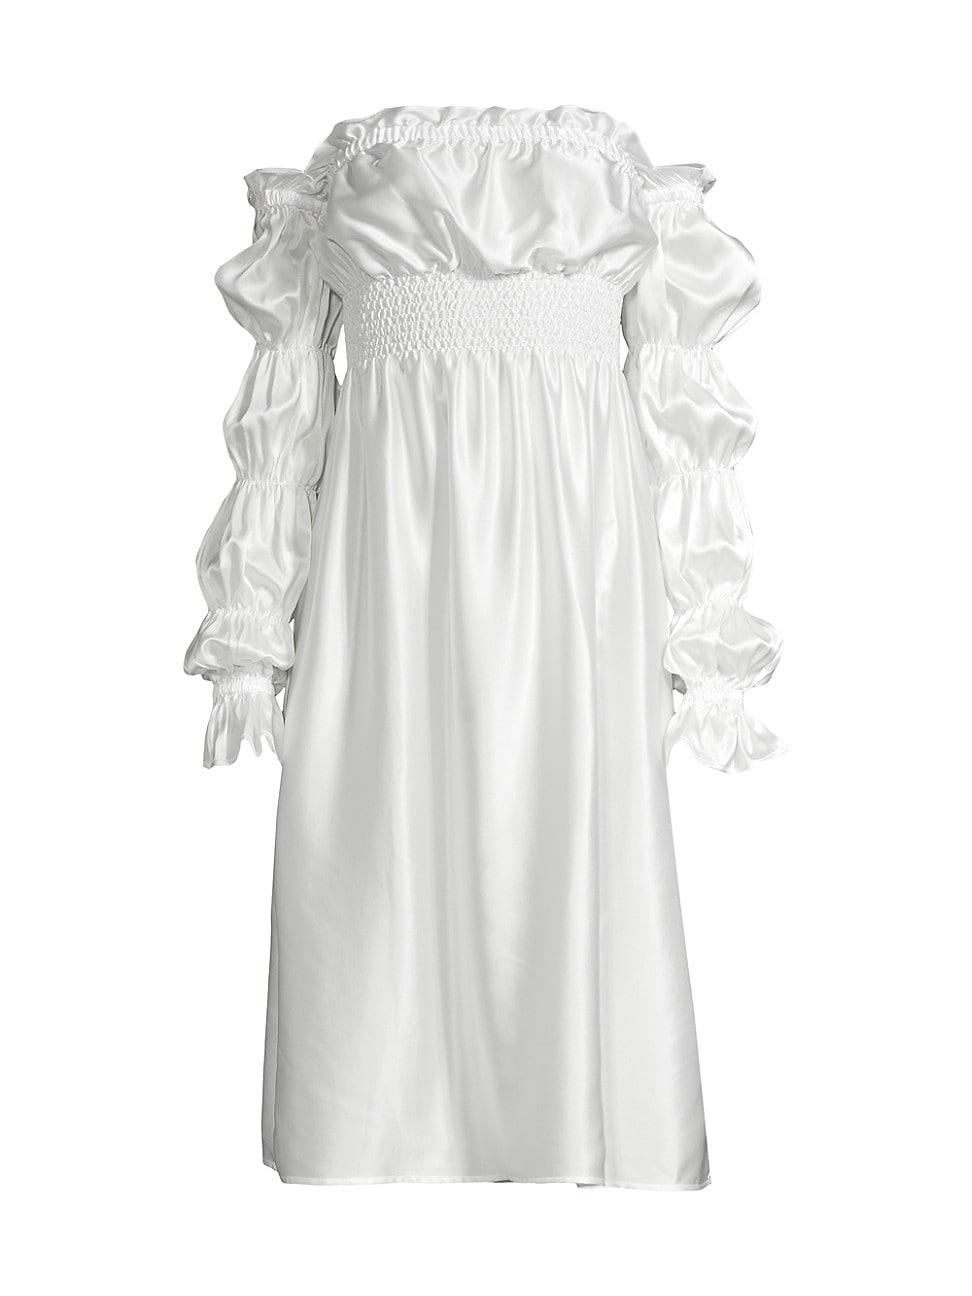 Sleeper WOMEN'S MICHELIN OFF-THE-SHOULDER SILK DRESS